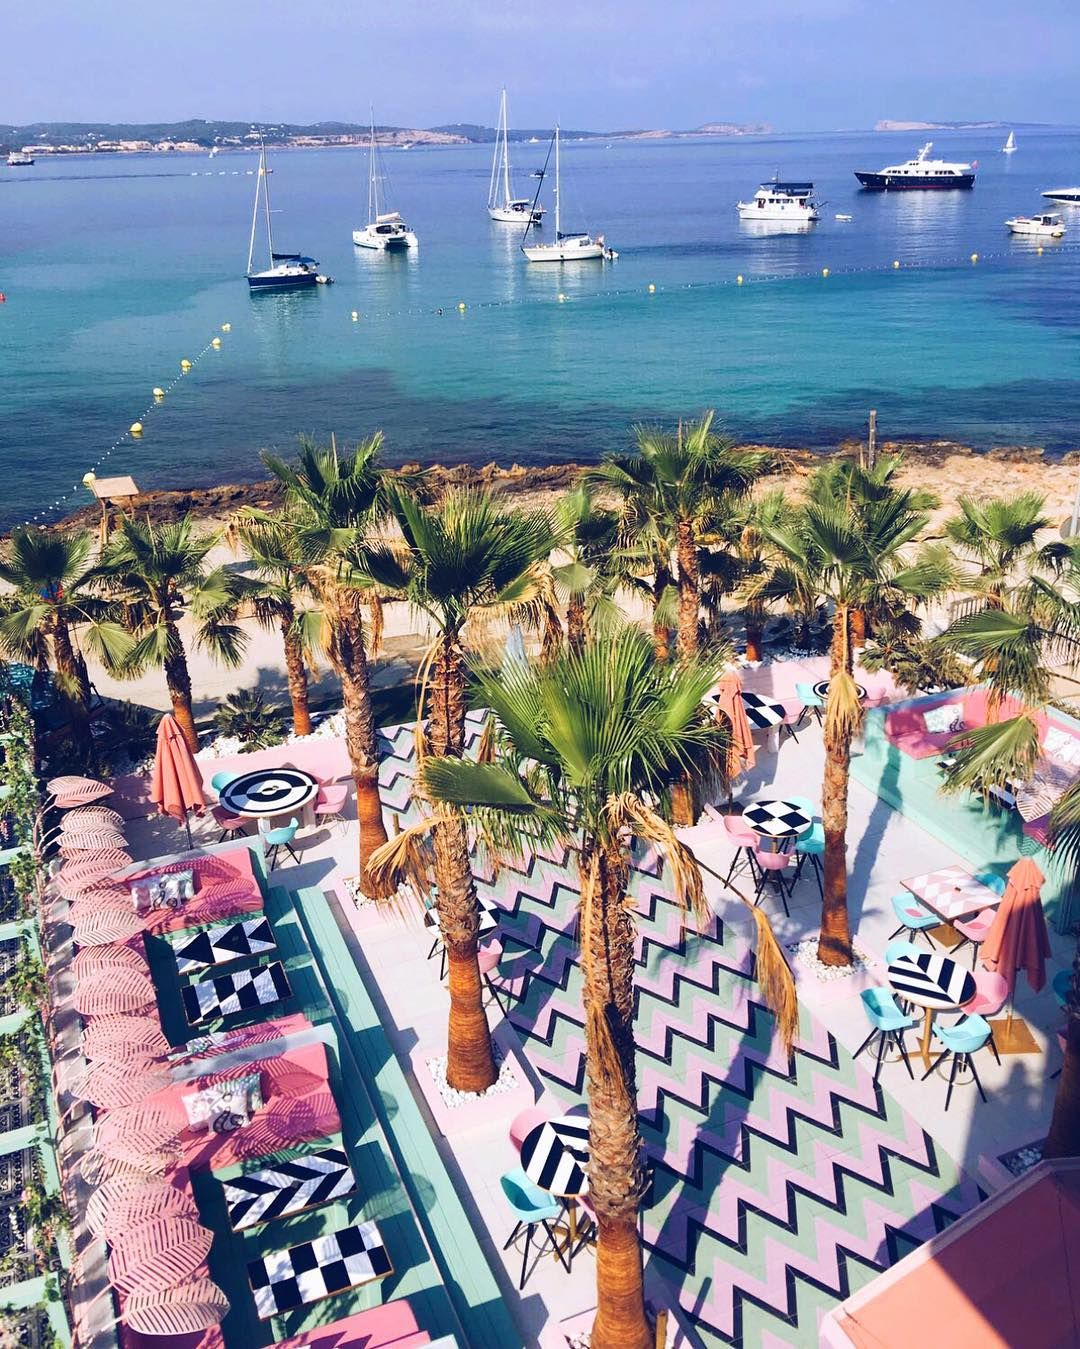 Who Would You Want To Wake Up To This View With Tag Your Wikiwoo Crew Wikiwoohotelibiza Wikiwooibiza Ibiza Travel Ibiza Holidays Ibiza Beach